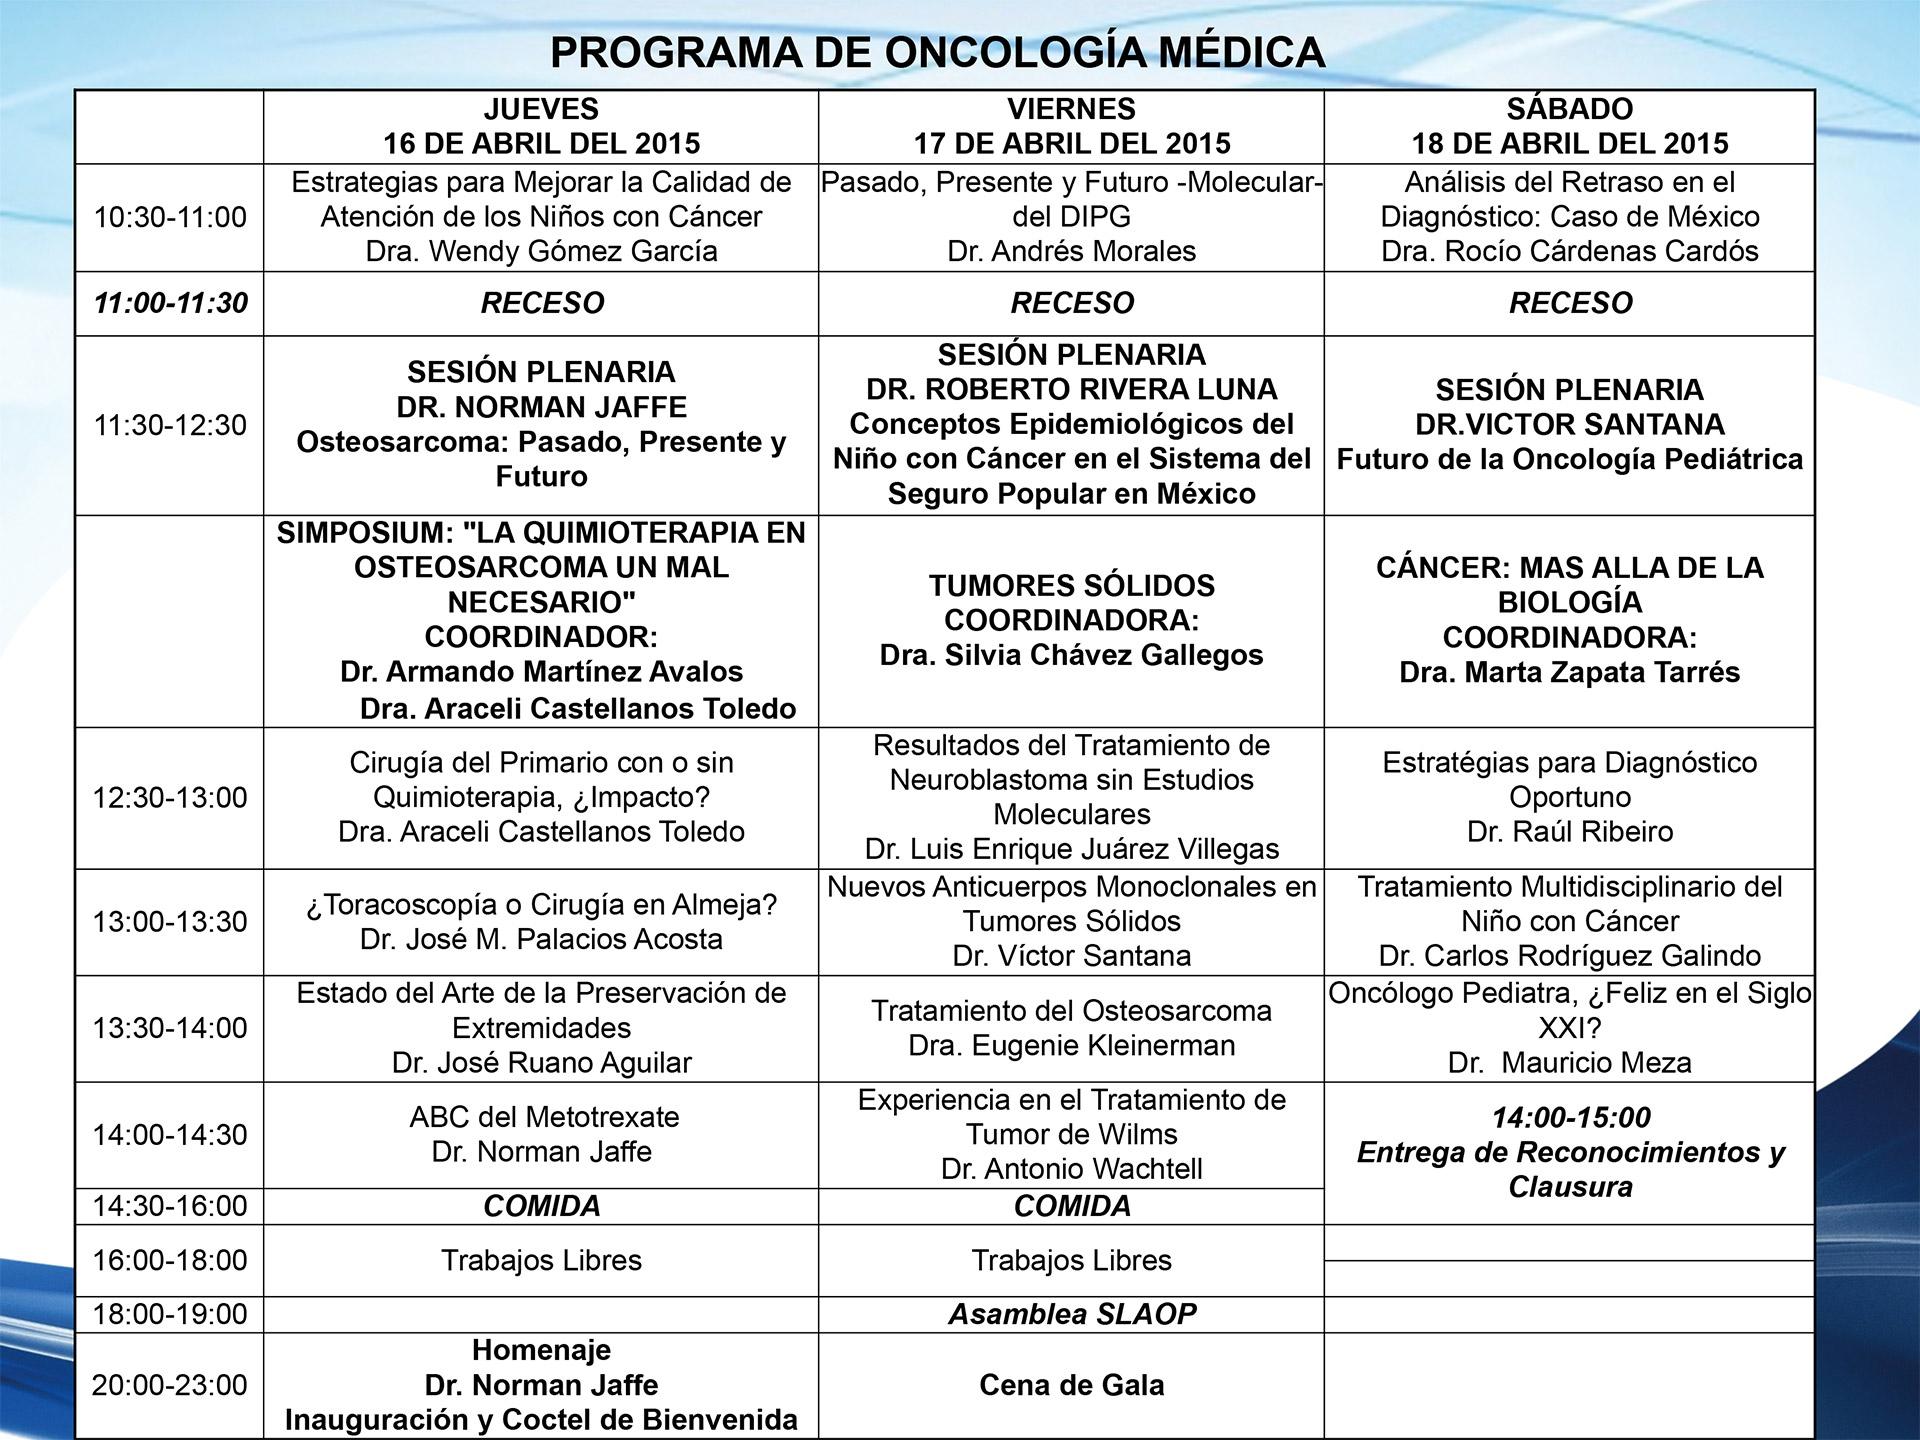 PROGRAMA-ONCOLOGIA-MEDICA-2